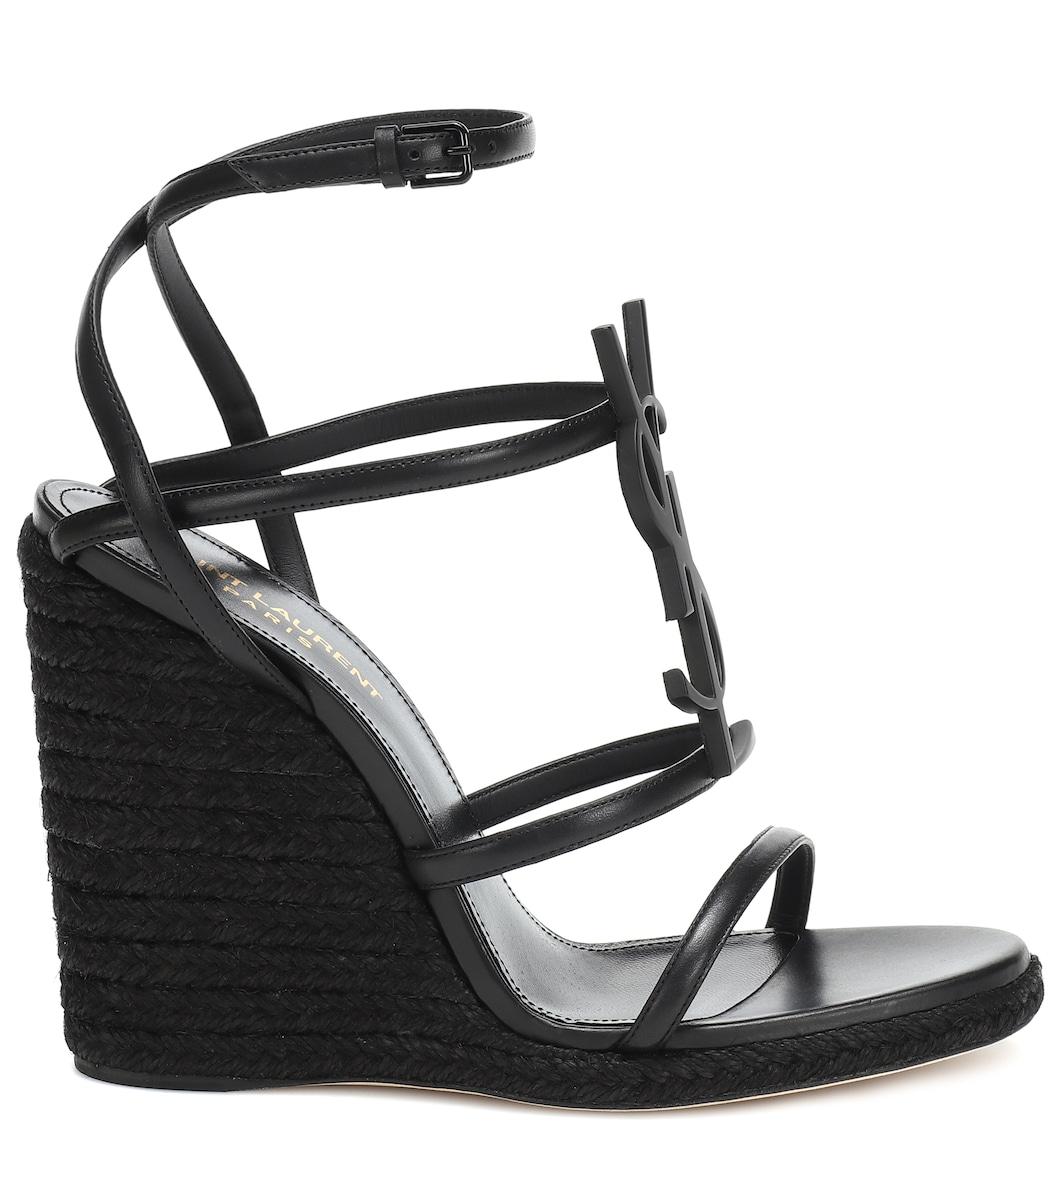 0f62d7f6bf15 Saint Laurent - Cassandra 115 wedge sandals